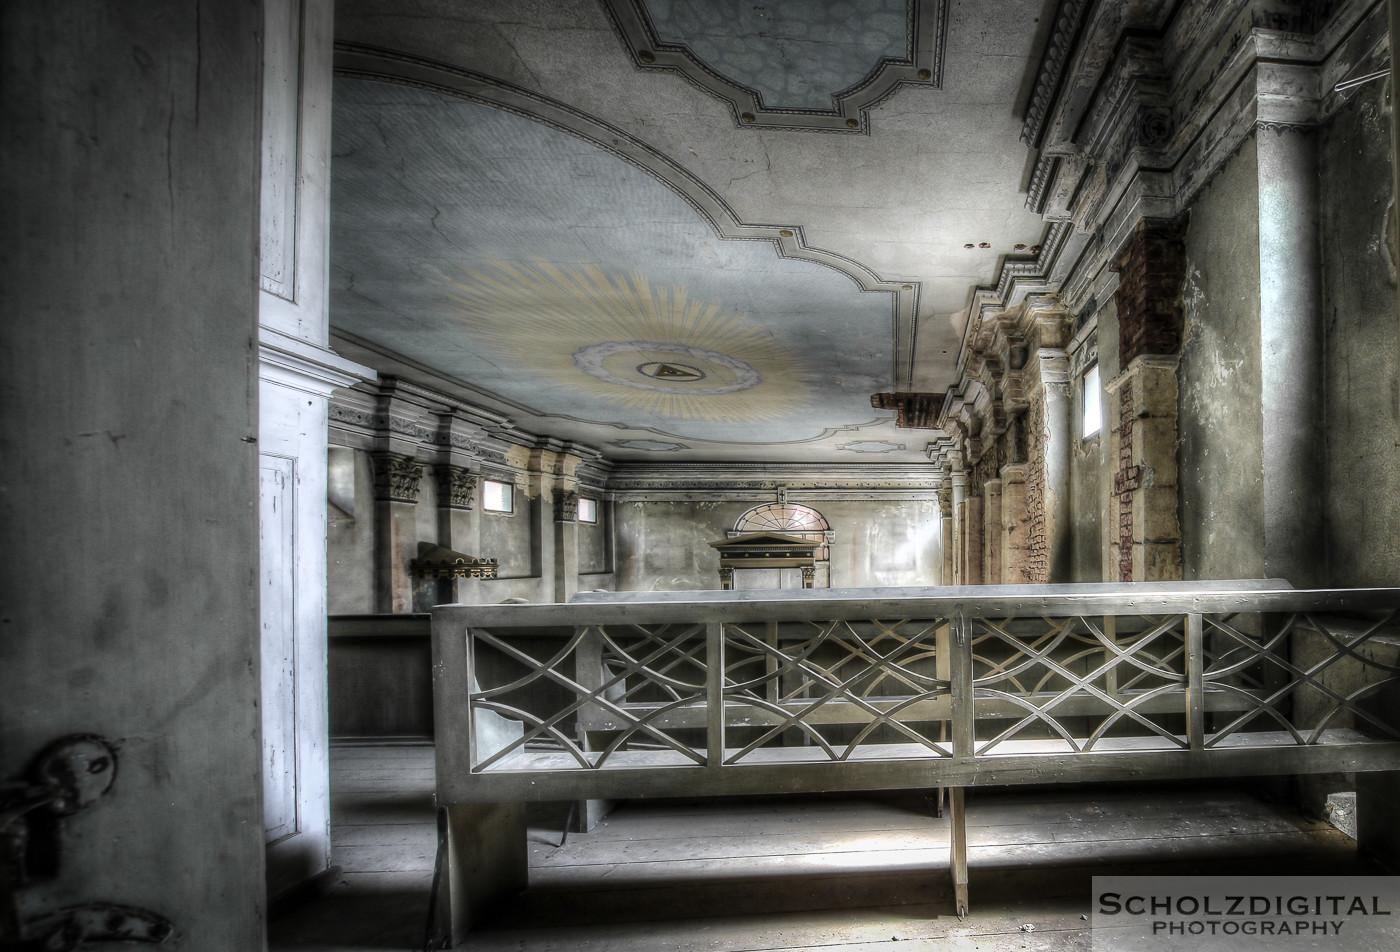 Abandoned, Abandoned Church, beelden, Decay, forgotten, Lost Place, Urban exploration, Urbex, urbexlocatie, verlassen, verlassene Kirche, Verlassene Orte